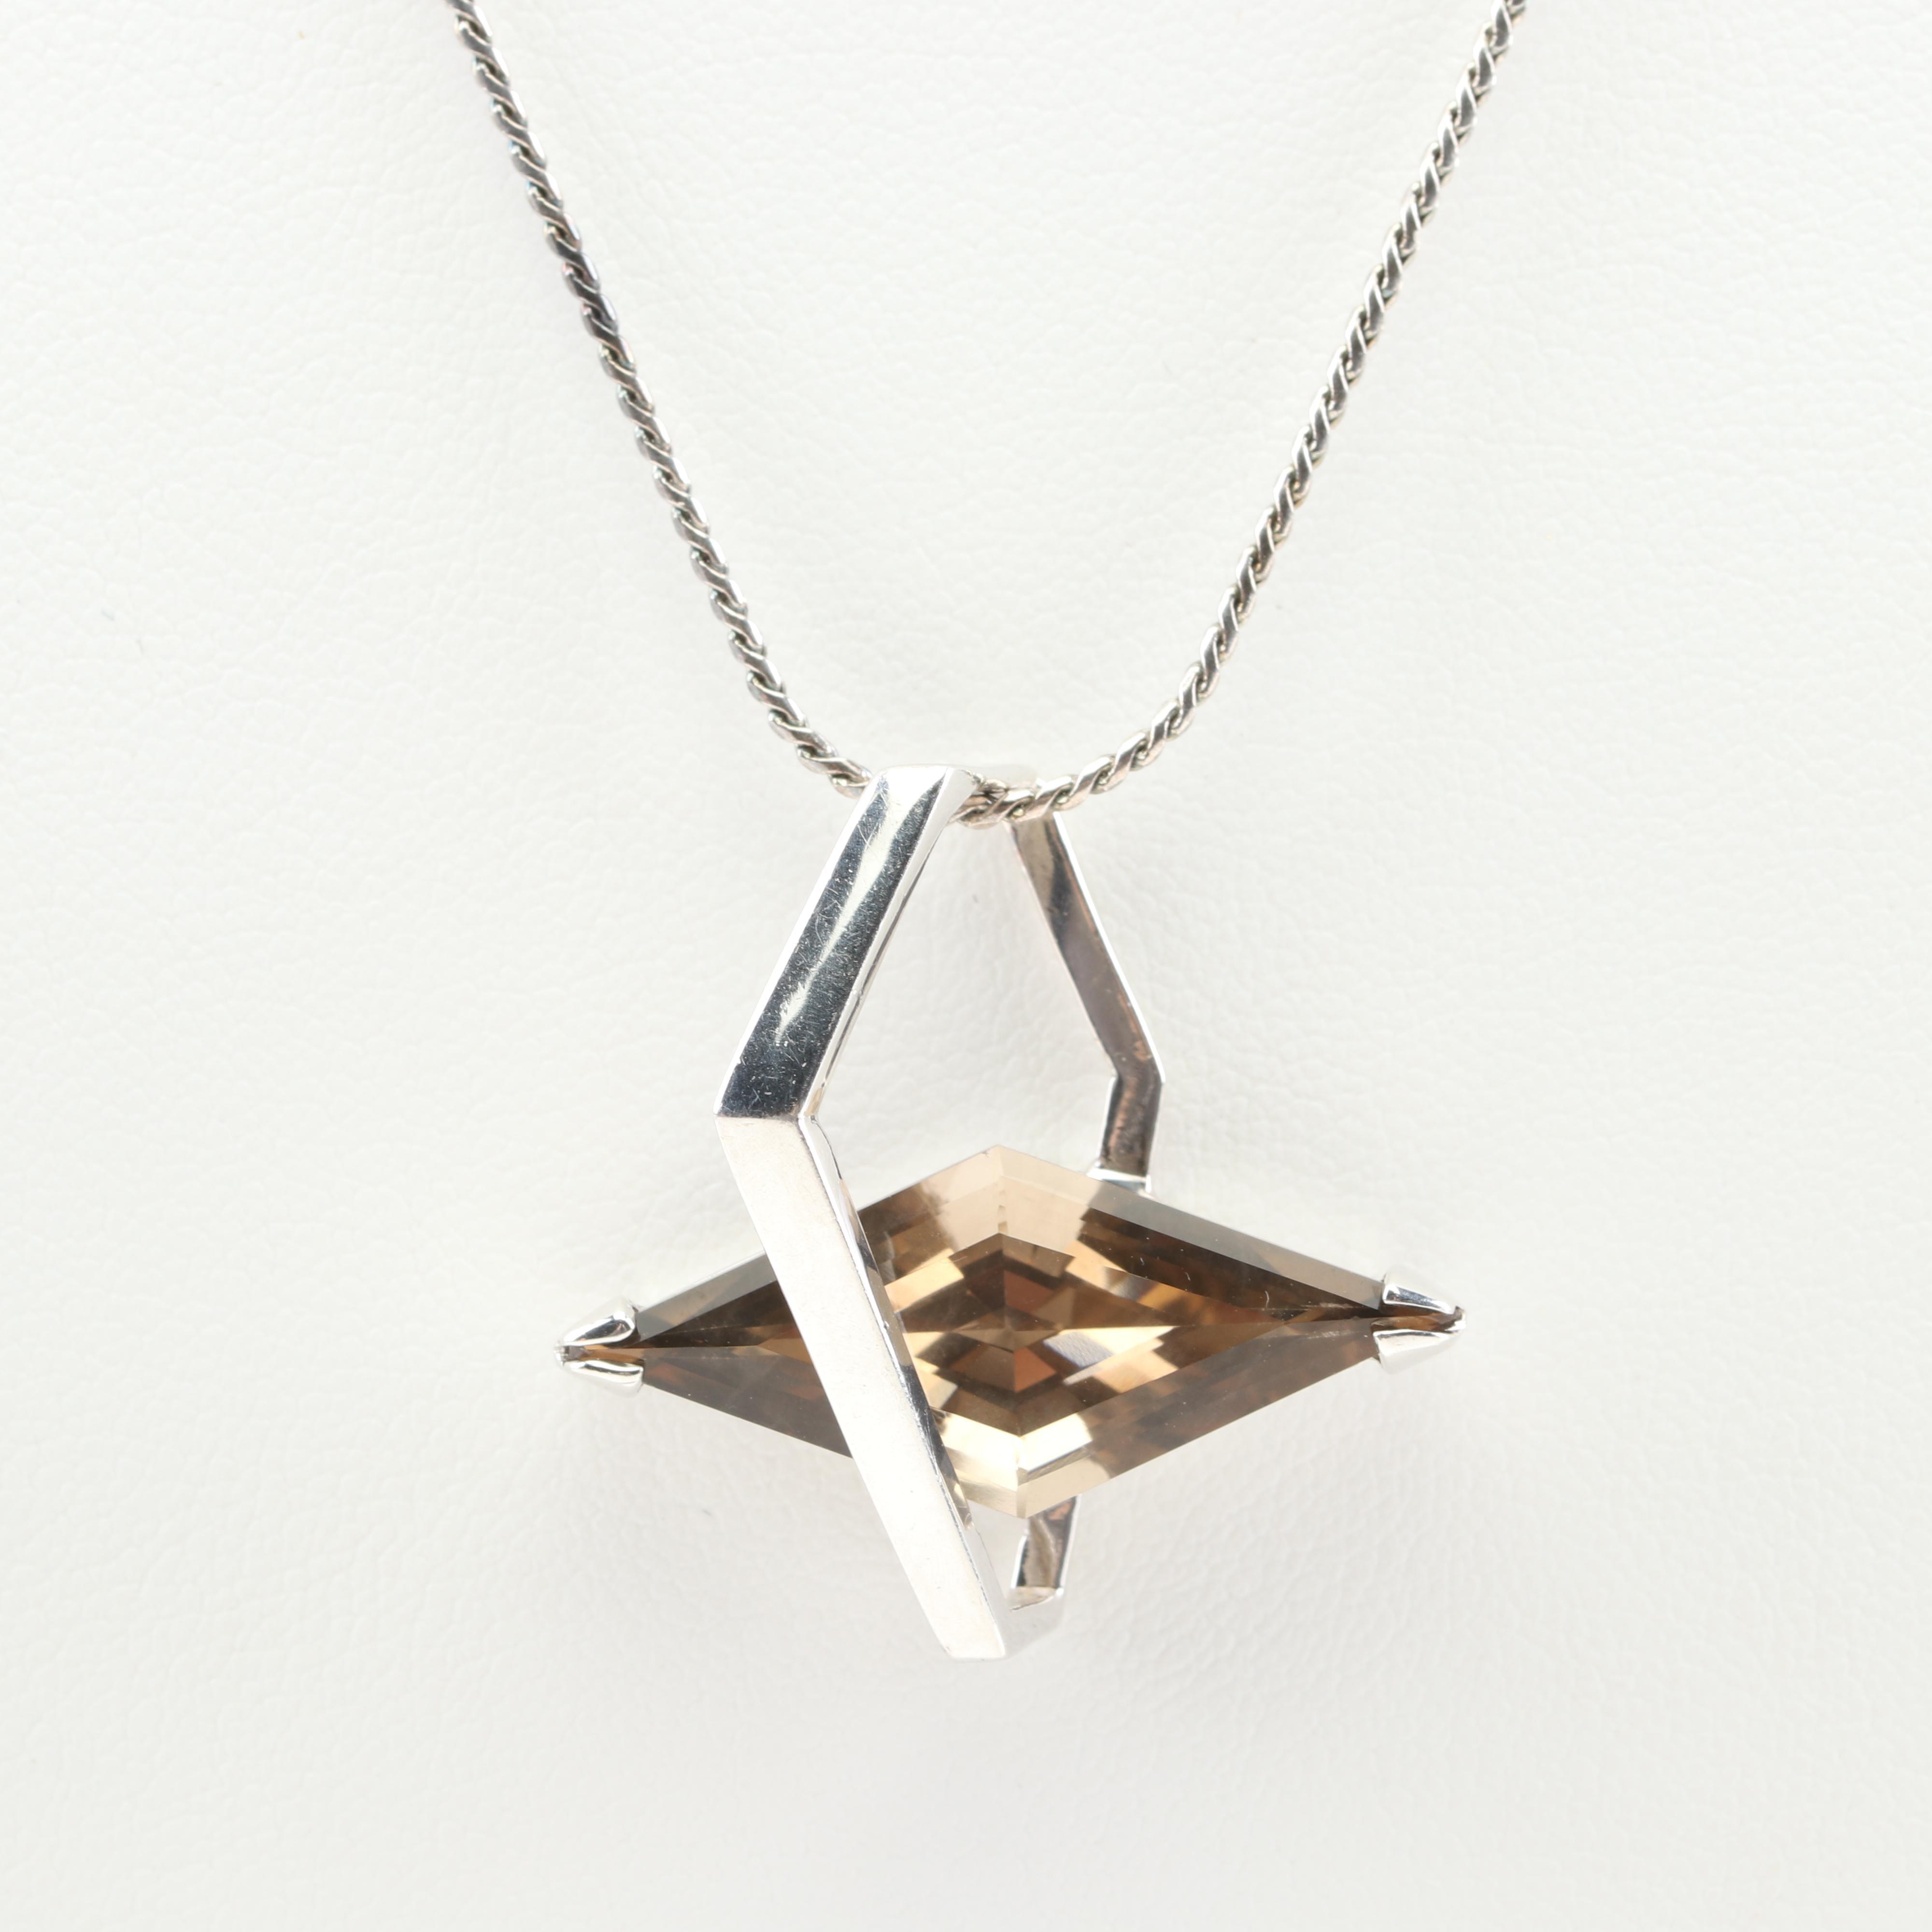 Sterling Silver Smoky Quartz Modern Necklace